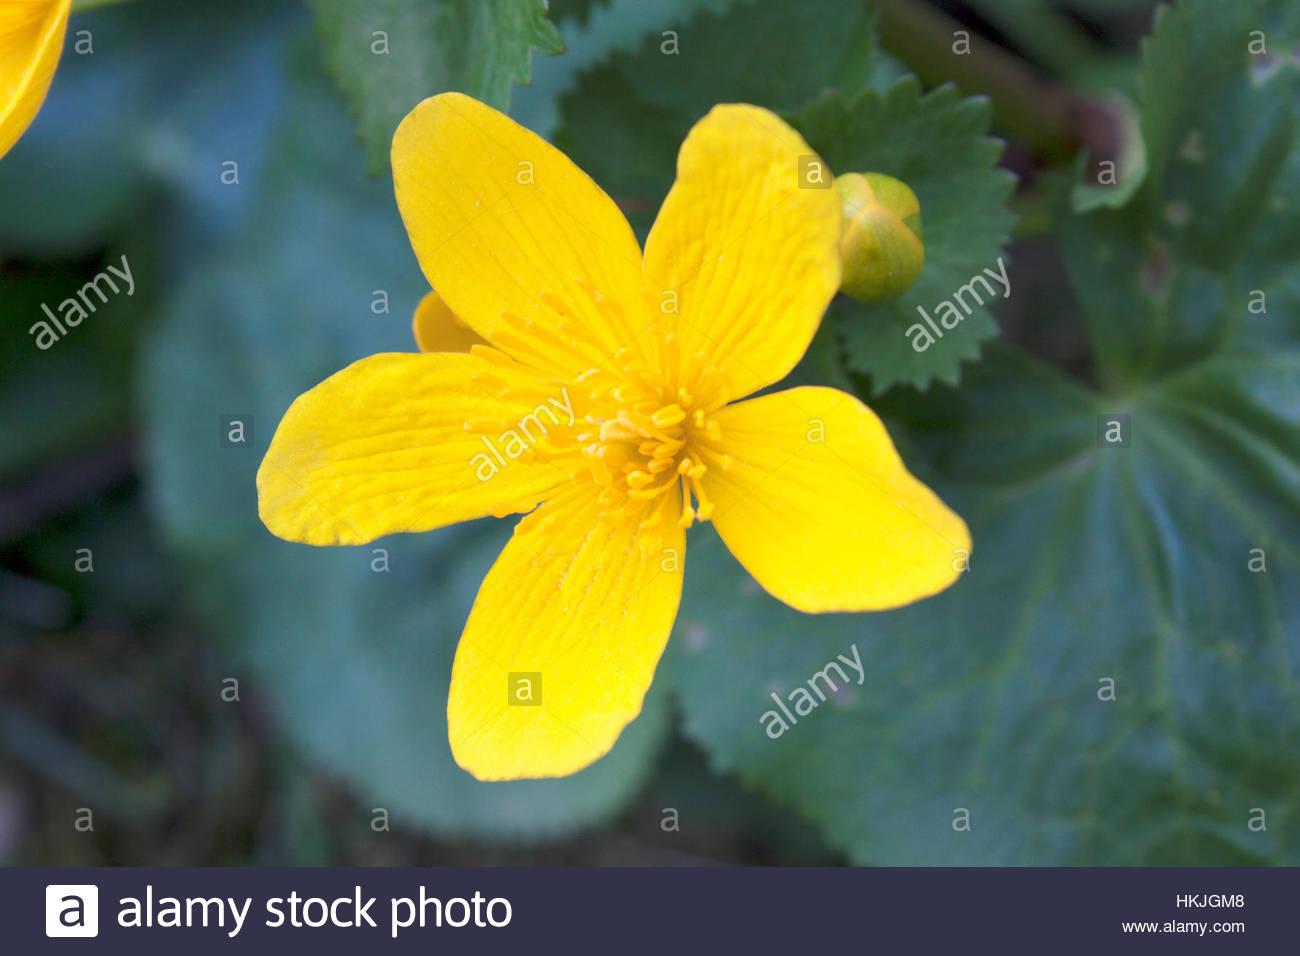 White flower five petals yellow stock photos white flower five yellow flower with five petals stock image mightylinksfo